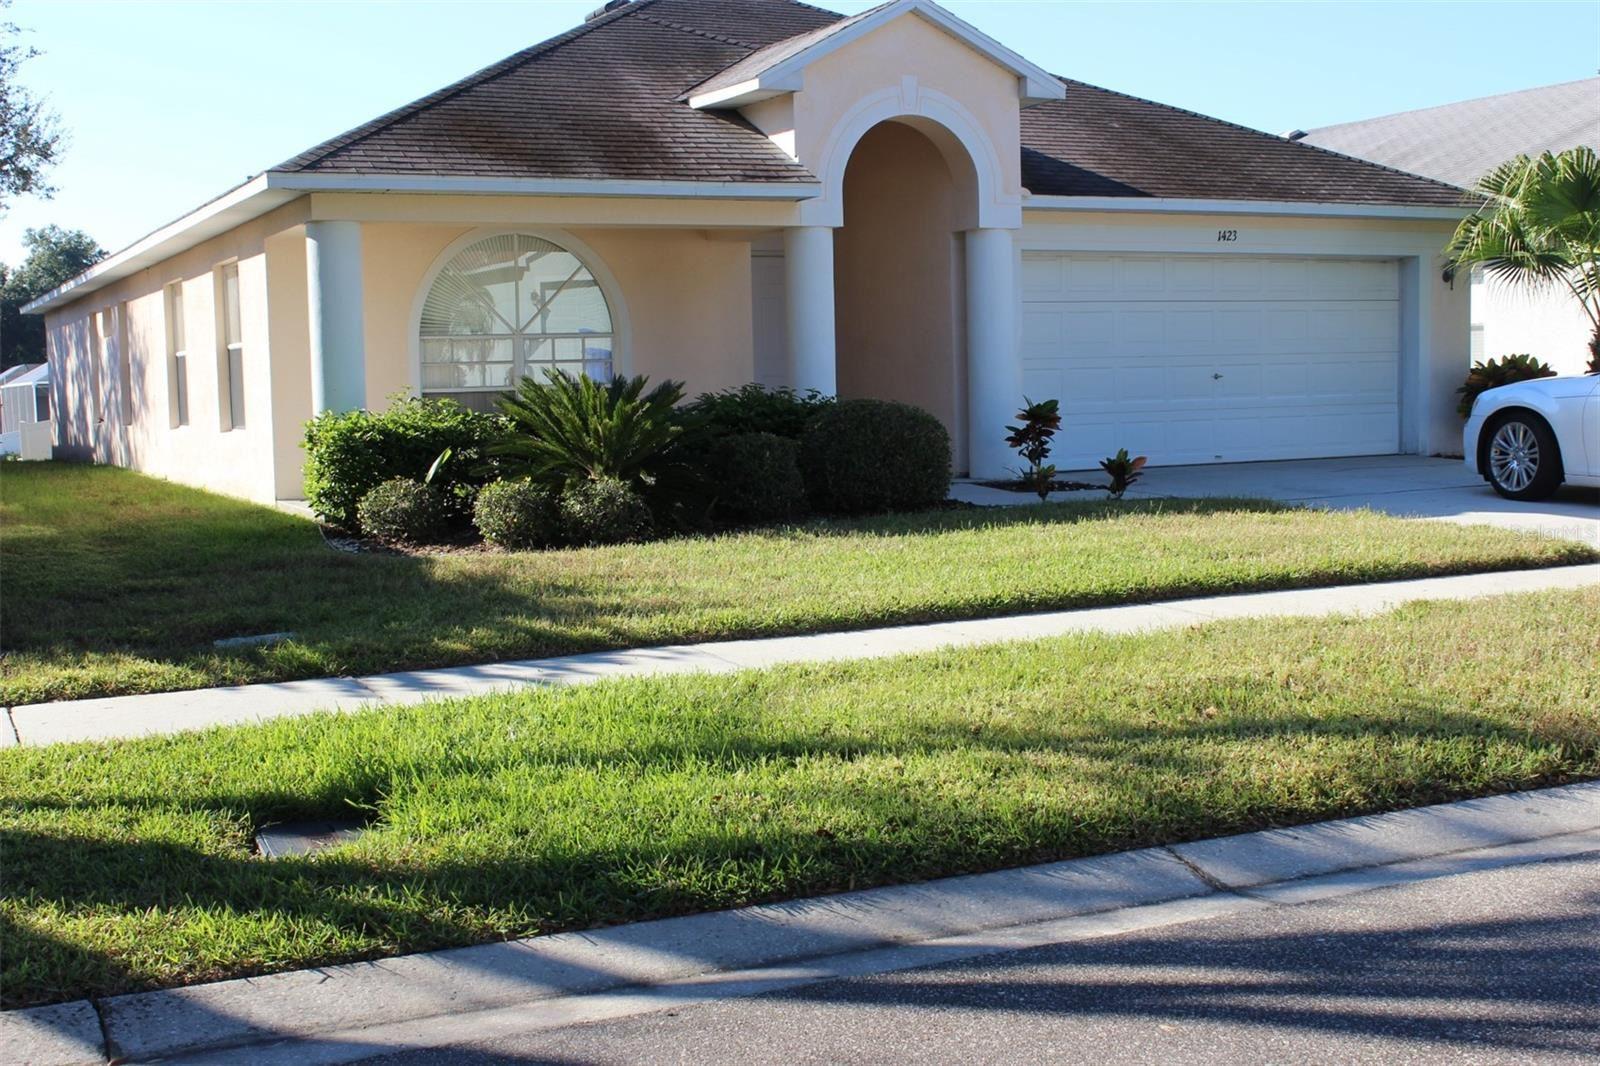 1423 SADDLE GOLD COURT, Brandon, FL 33511 - MLS#: T3330380